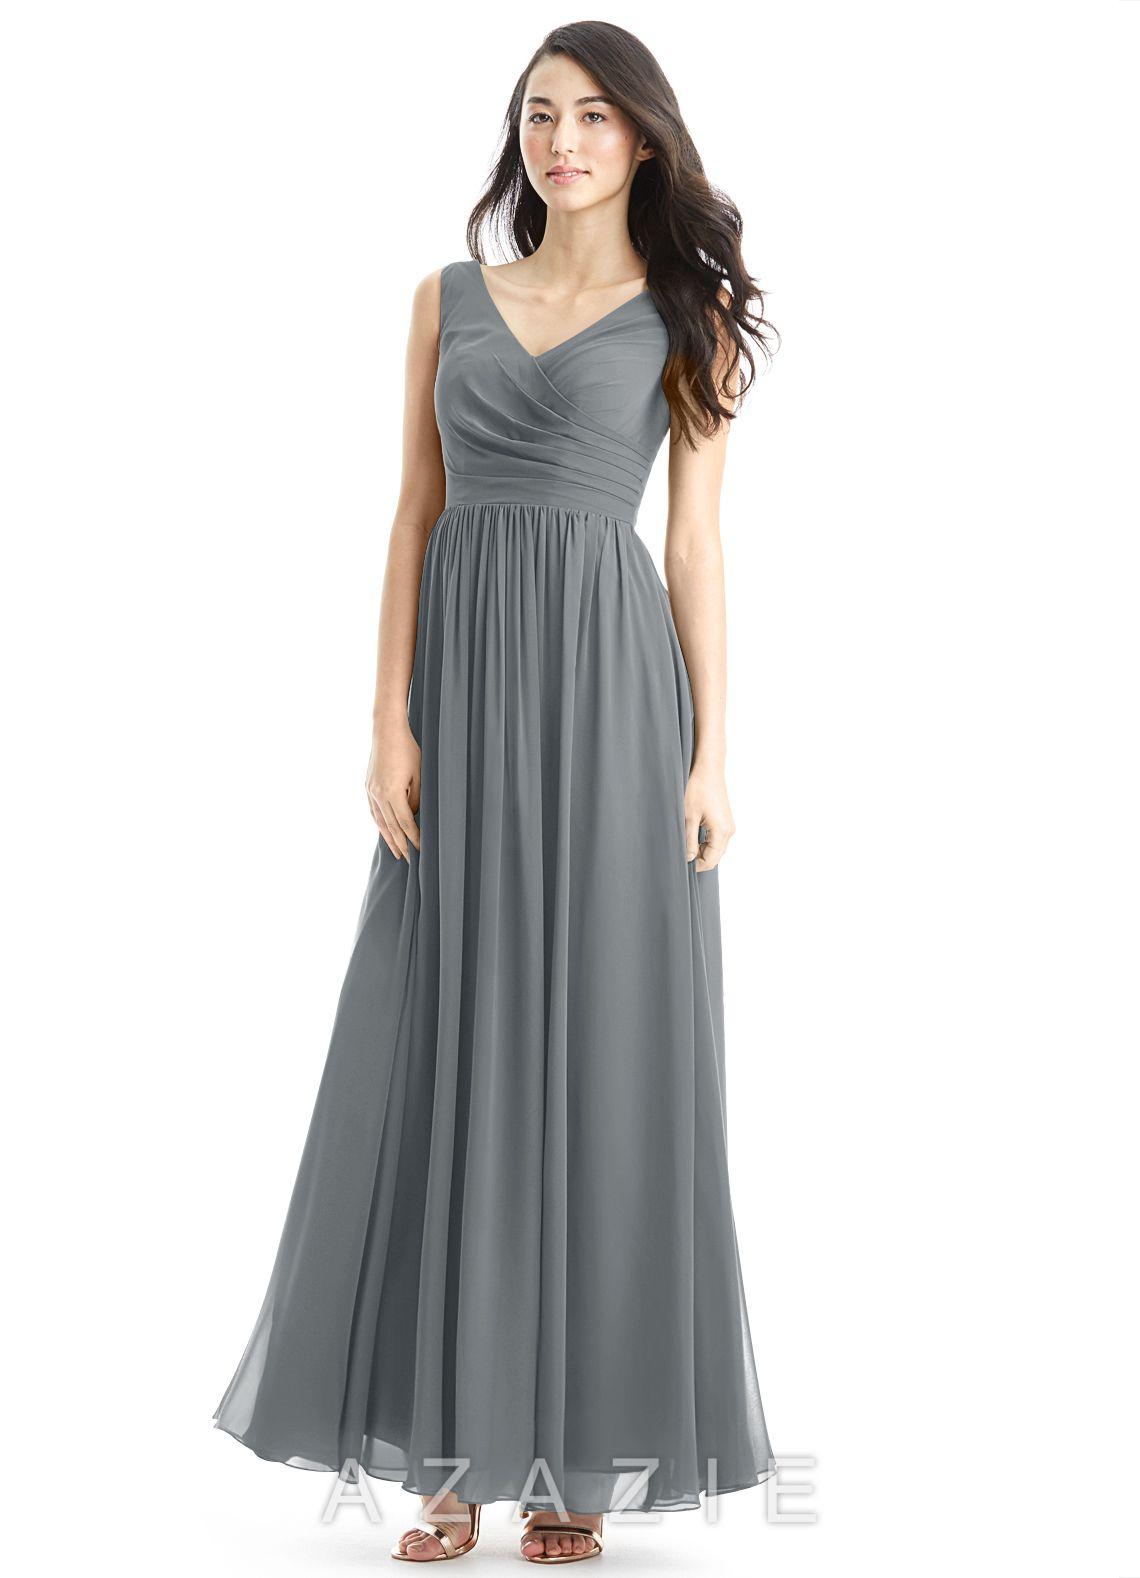 Azazie keyla bridesmaid dresses azazie bridesmaid